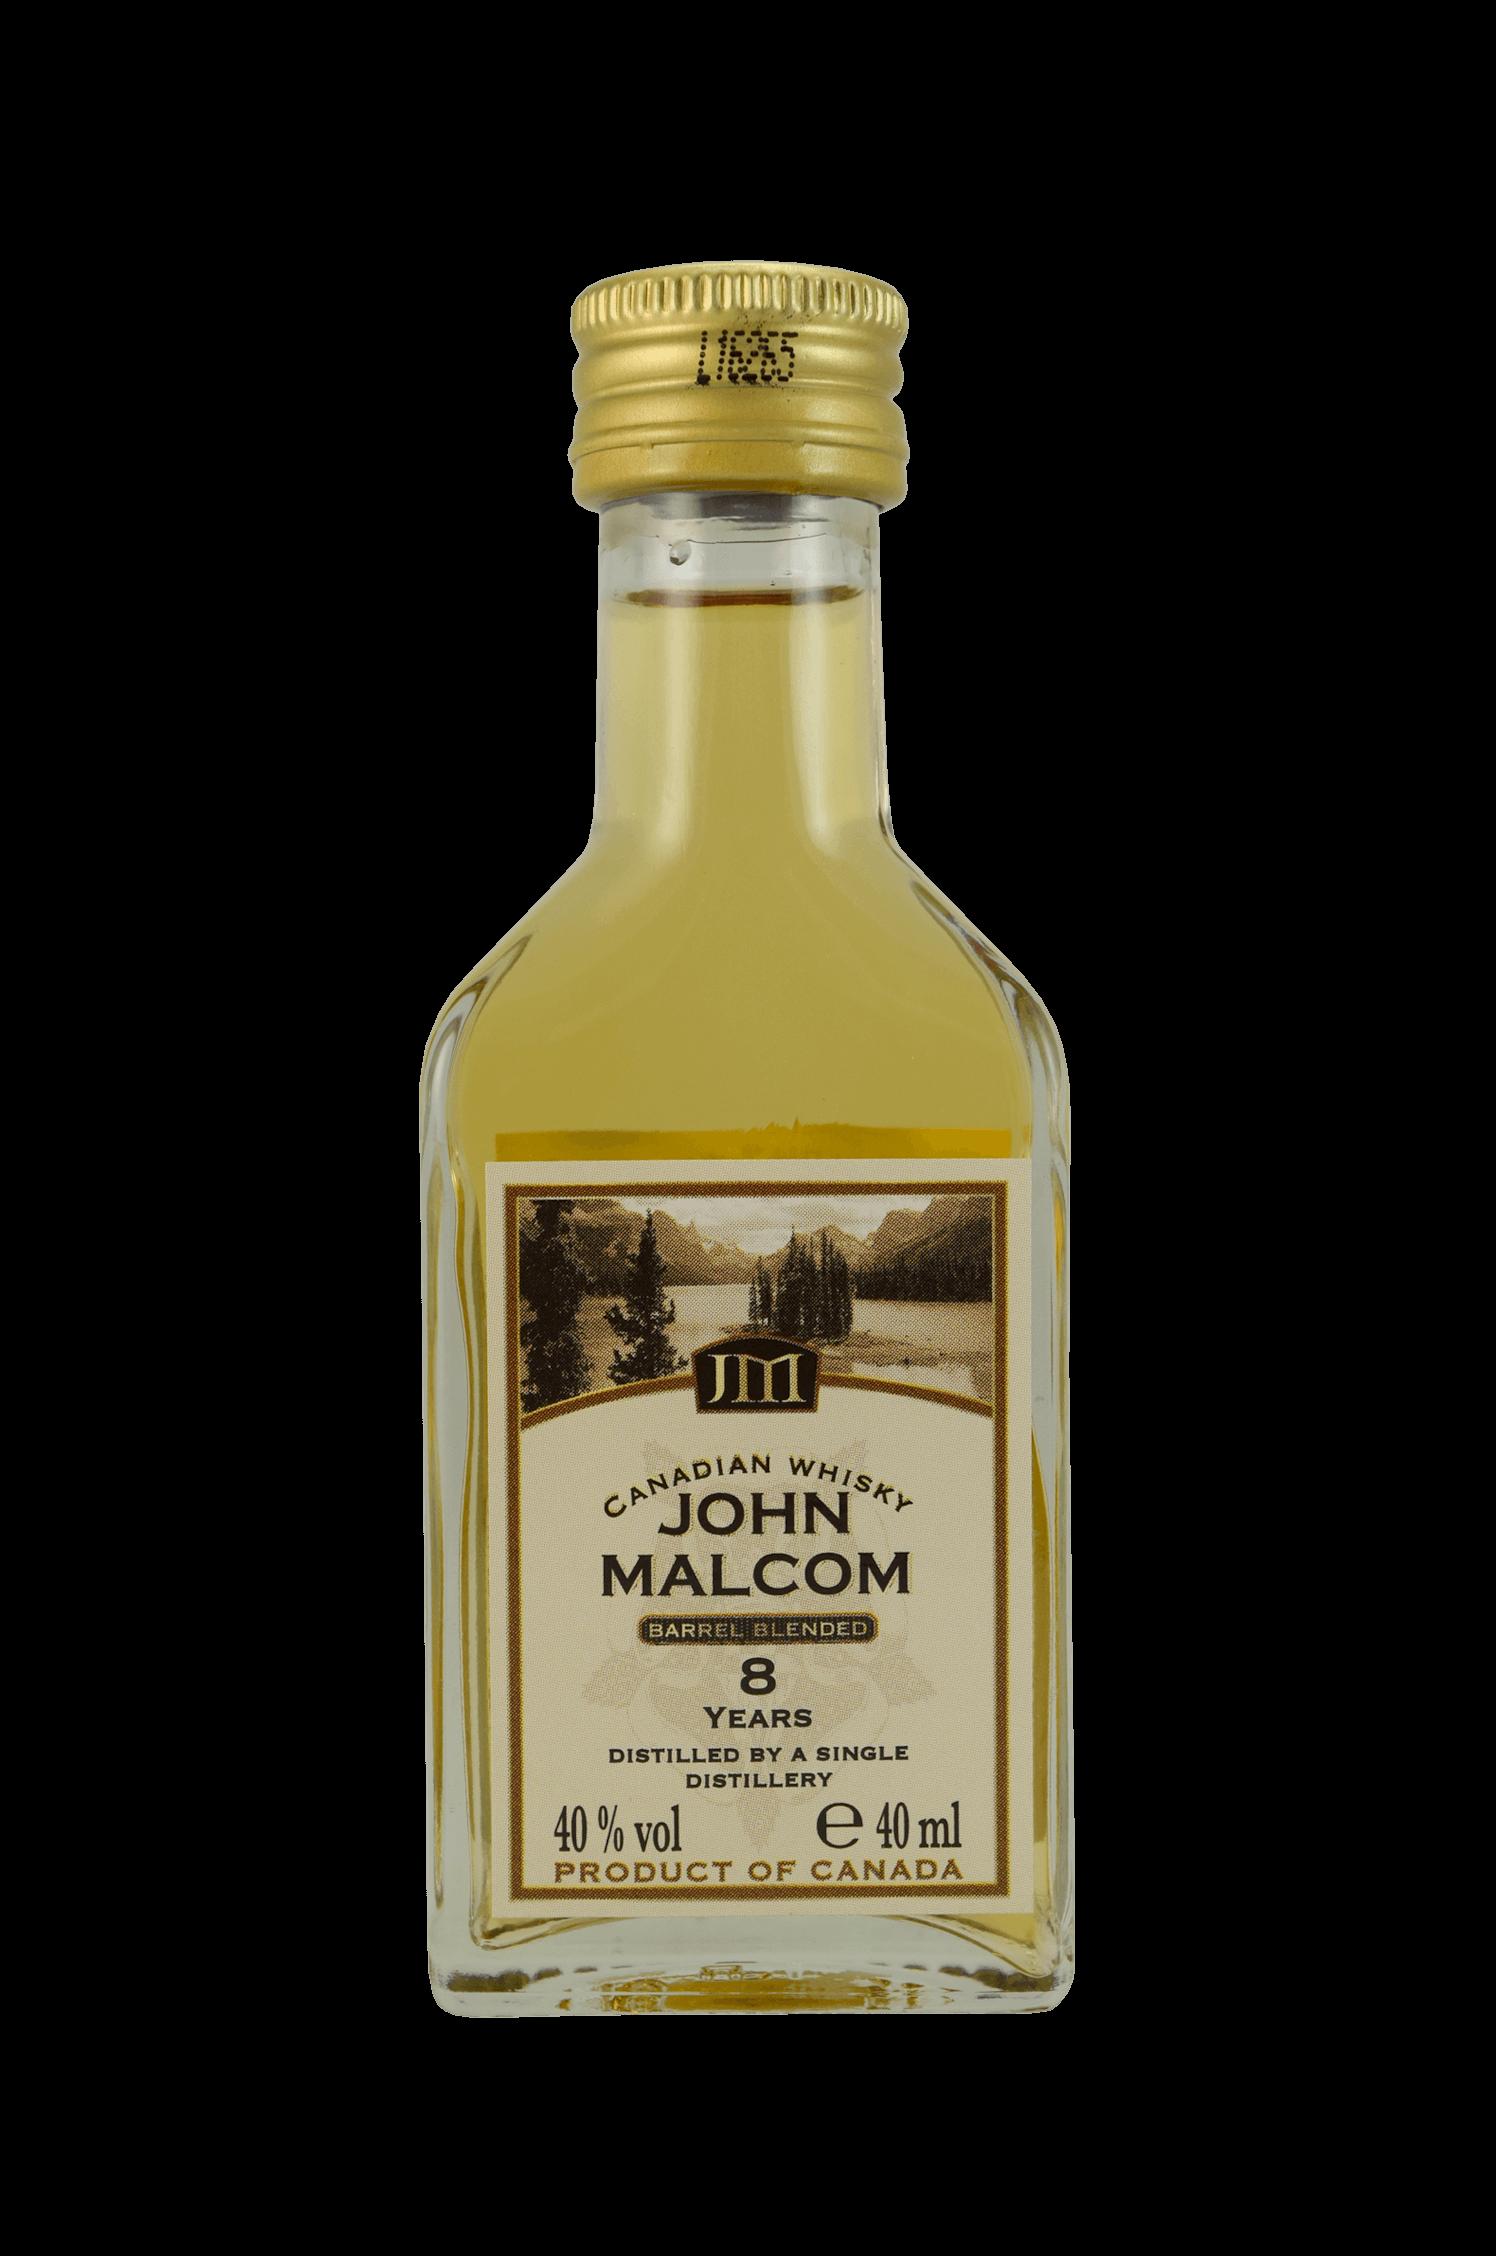 John Malcom 8 Years Whisky